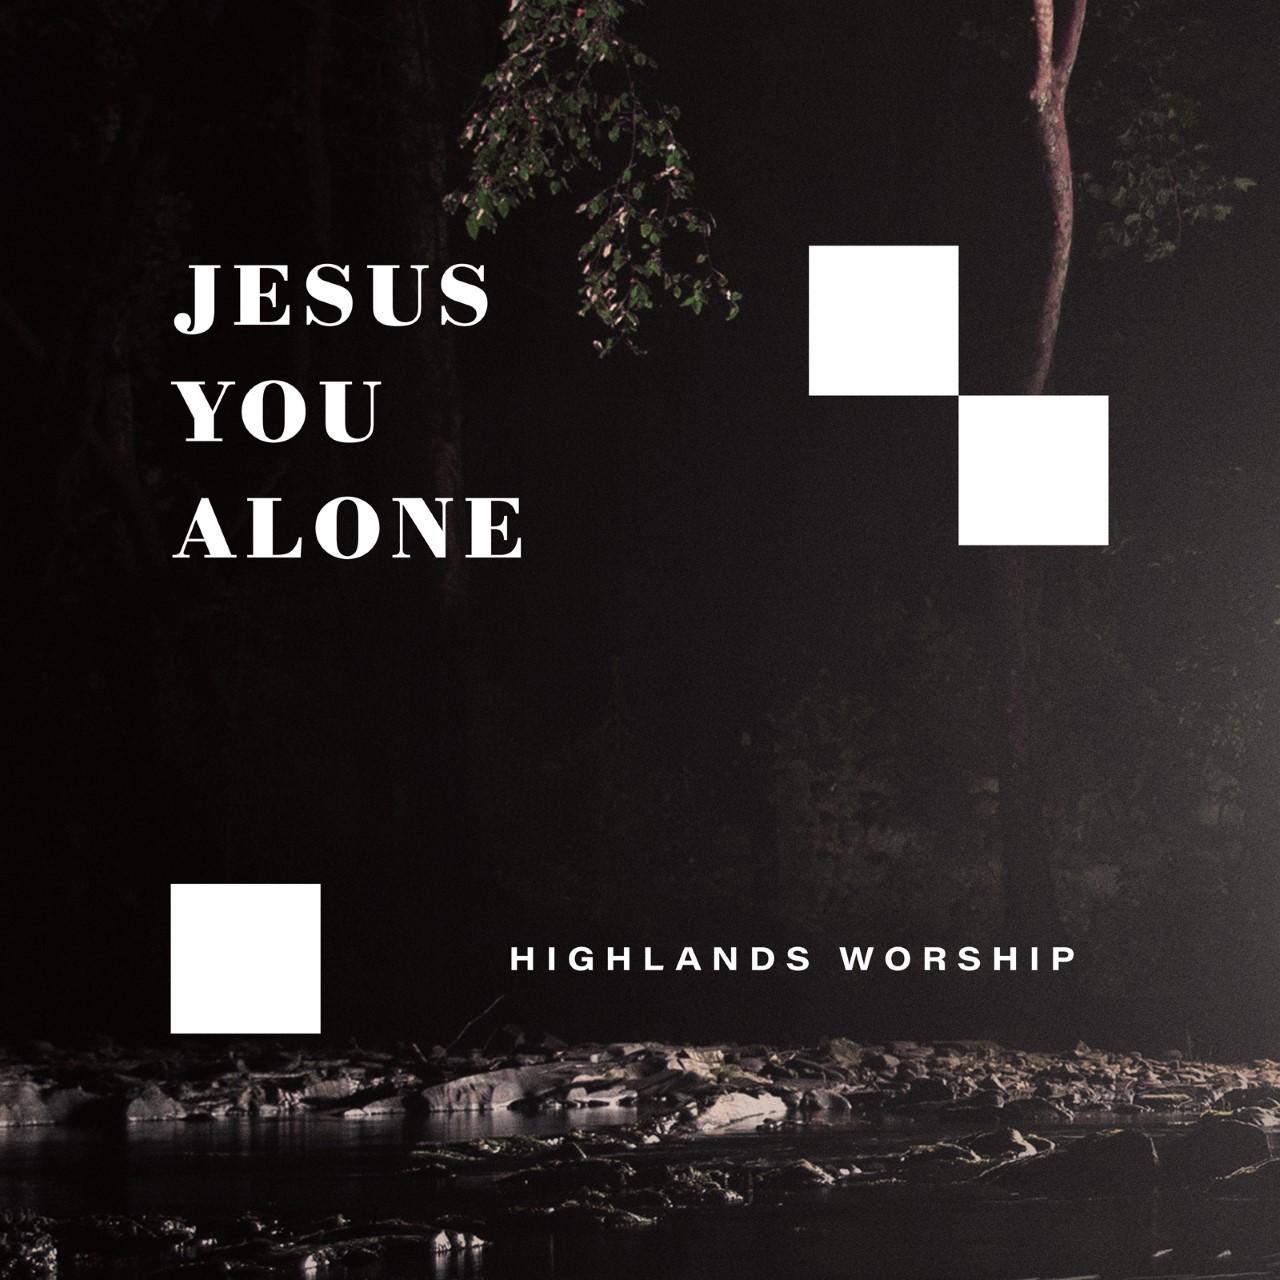 Jesus You Alone - Highlands Worship